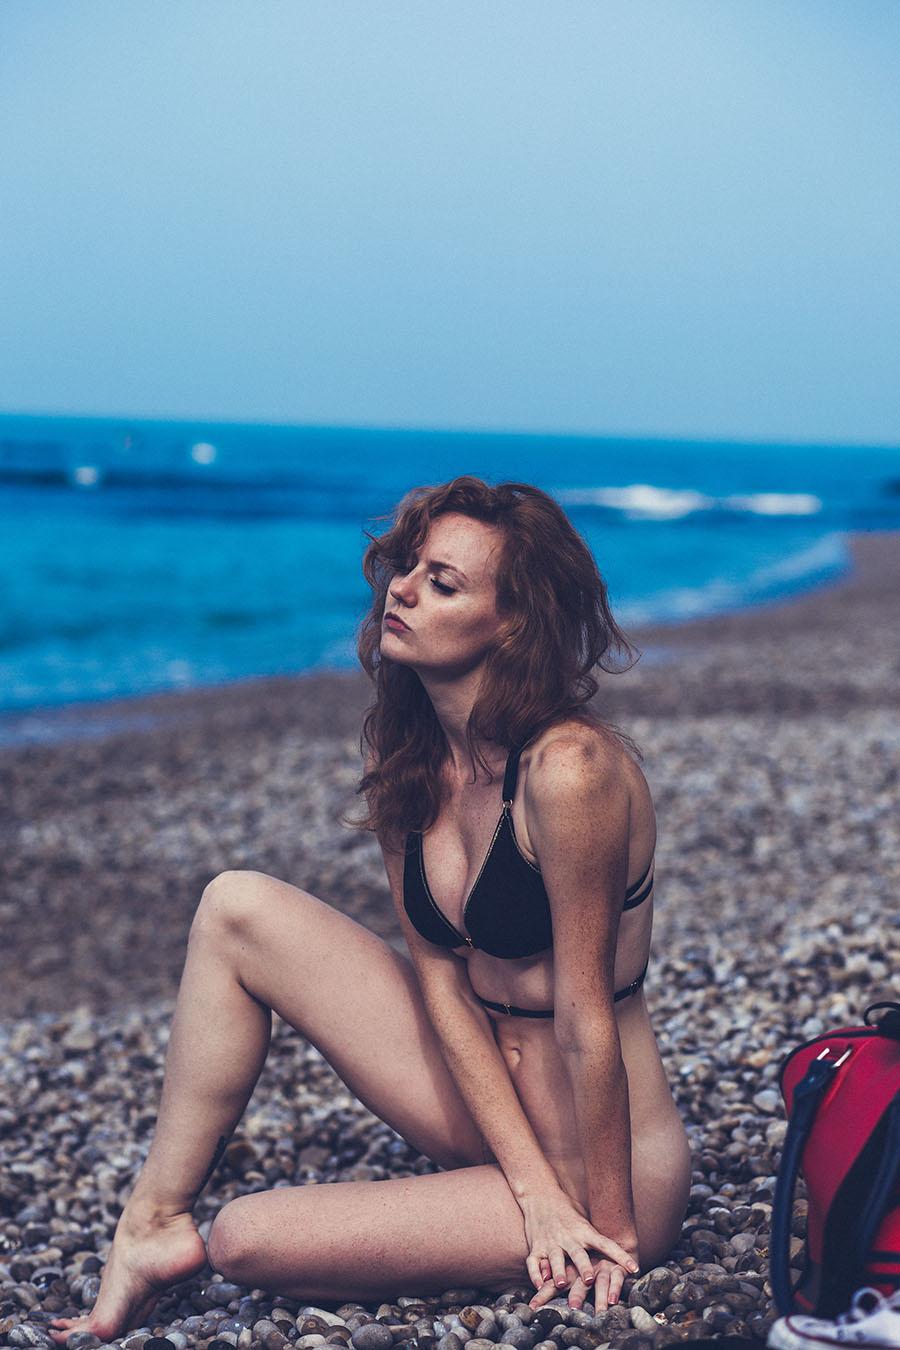 Celine Andrea nude (75 foto), foto Sexy, iCloud, swimsuit 2020